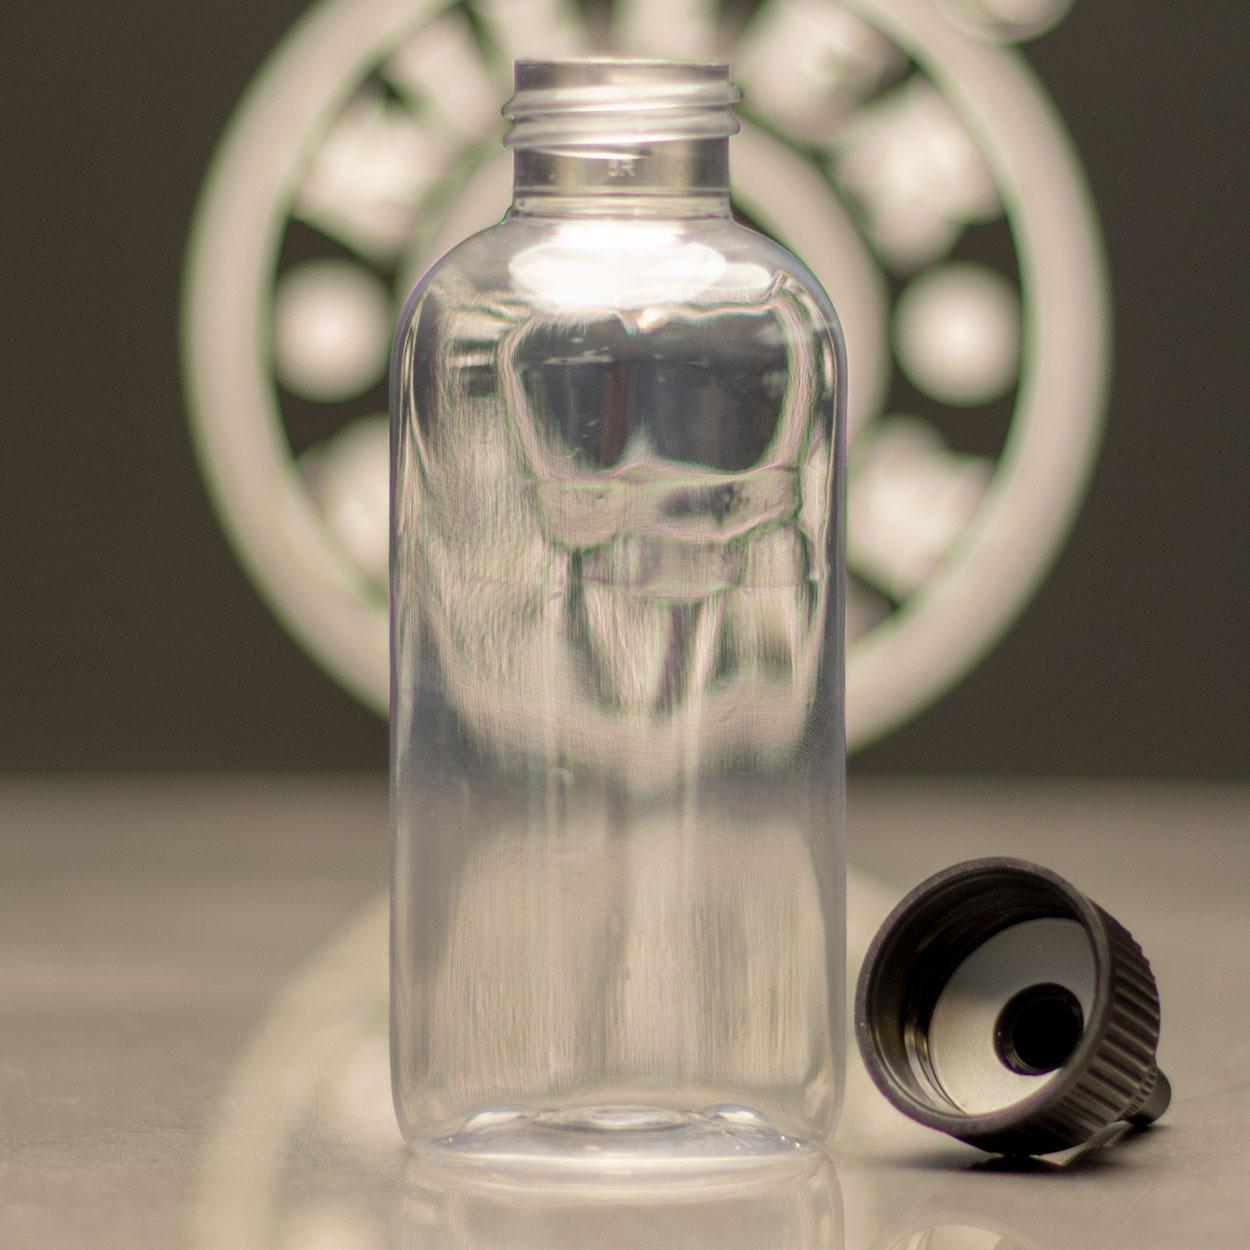 Empty Bottle - Boston Round - 4 oz - Killer Silver